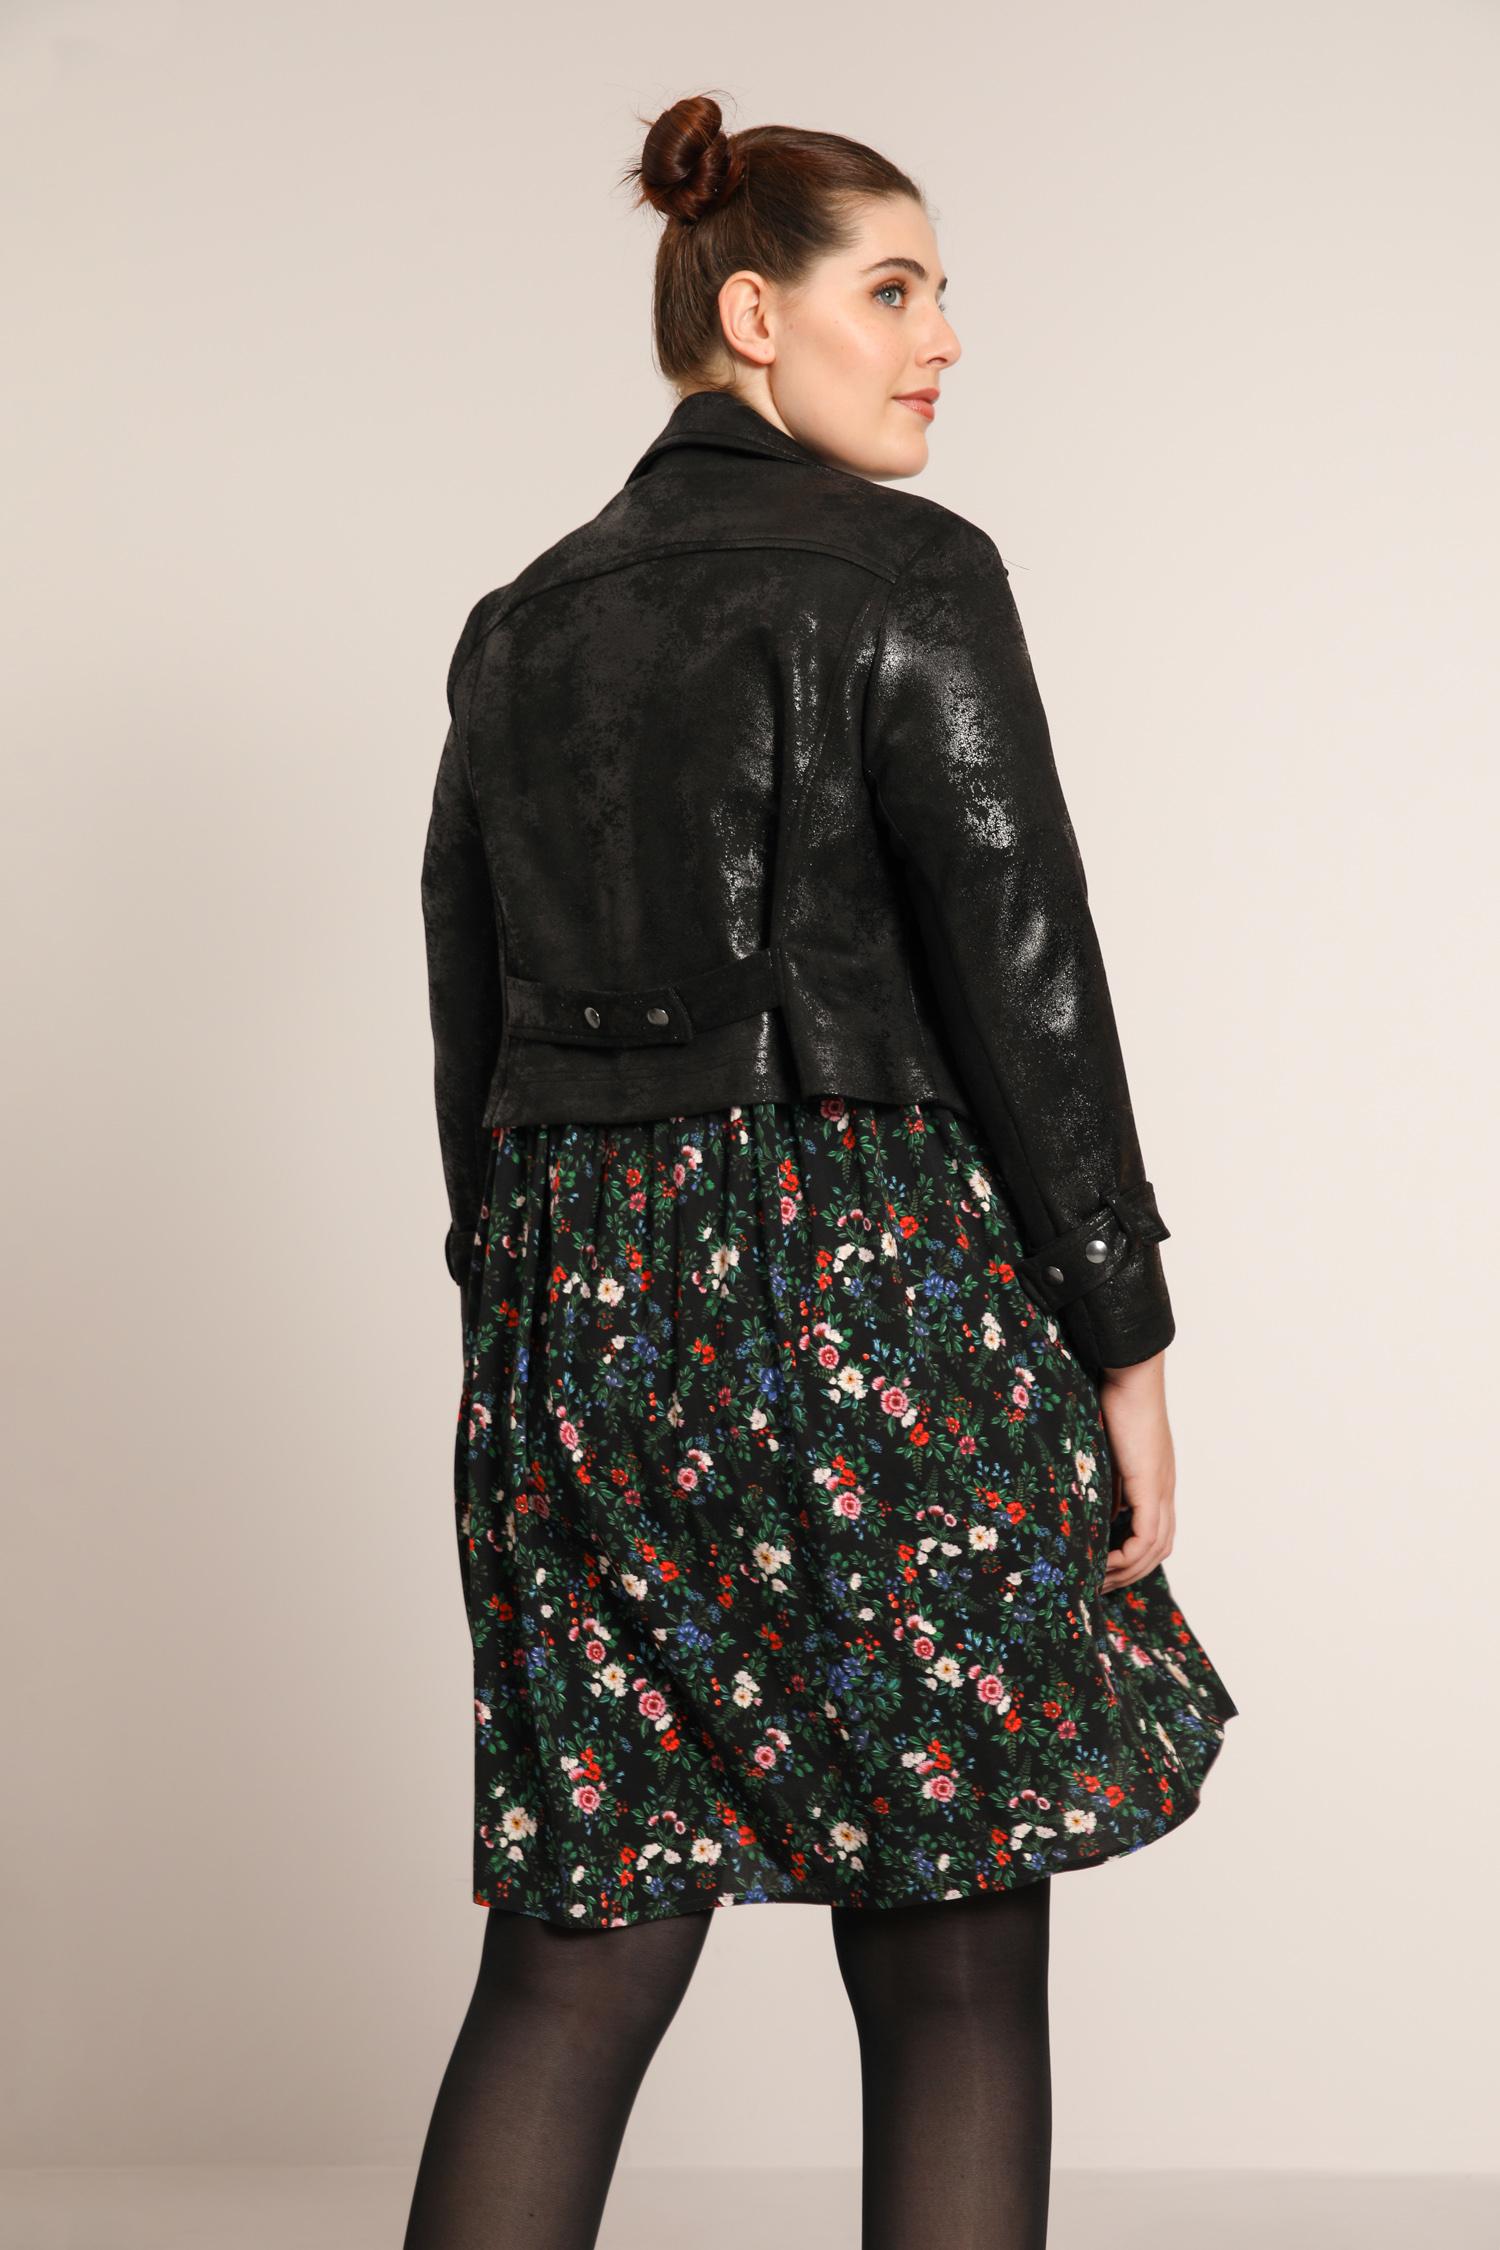 Cropped biker jacket in aged vegan leather